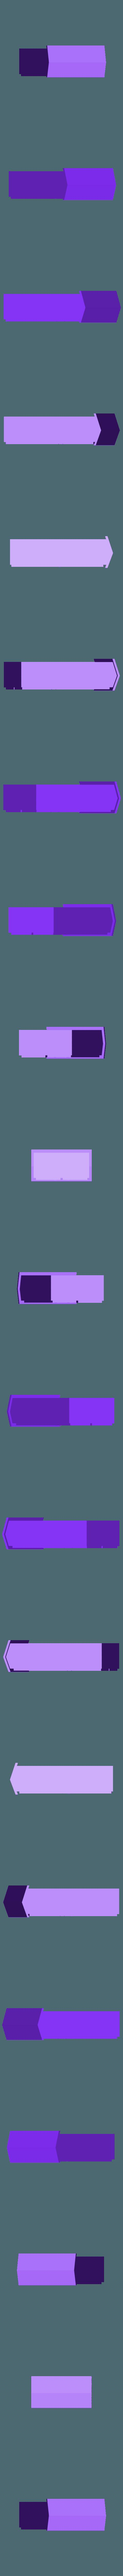 Armoire electrique.STL Download STL file SNCF lighting pylon • 3D printable object, dede34500